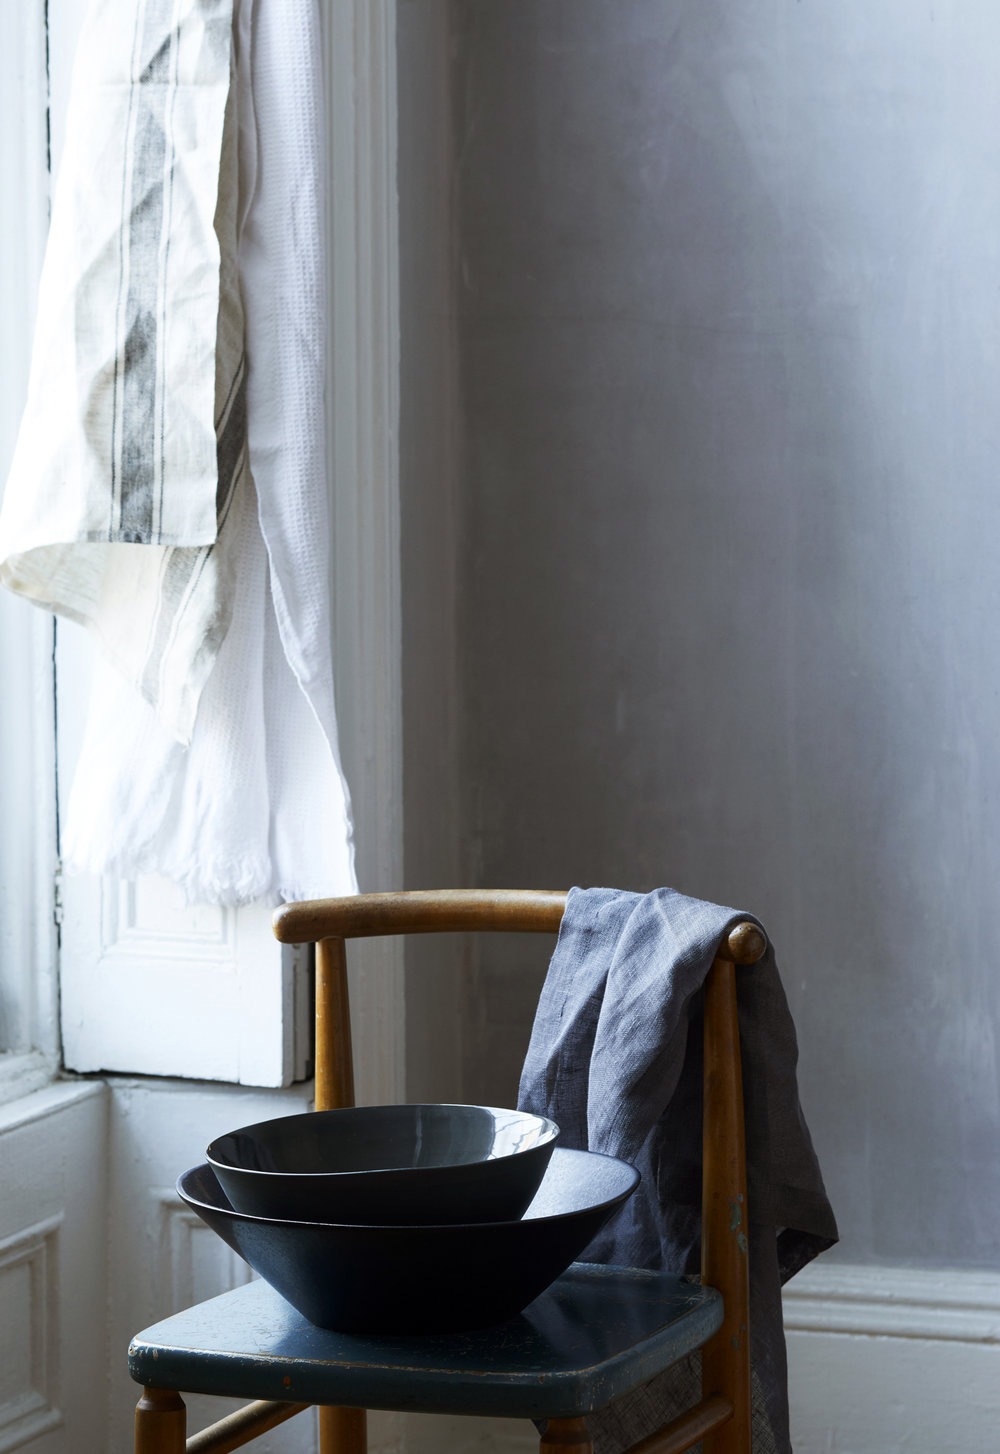 linens_bowls_dana_gallagher_studio0004_cc_2100px.jpg